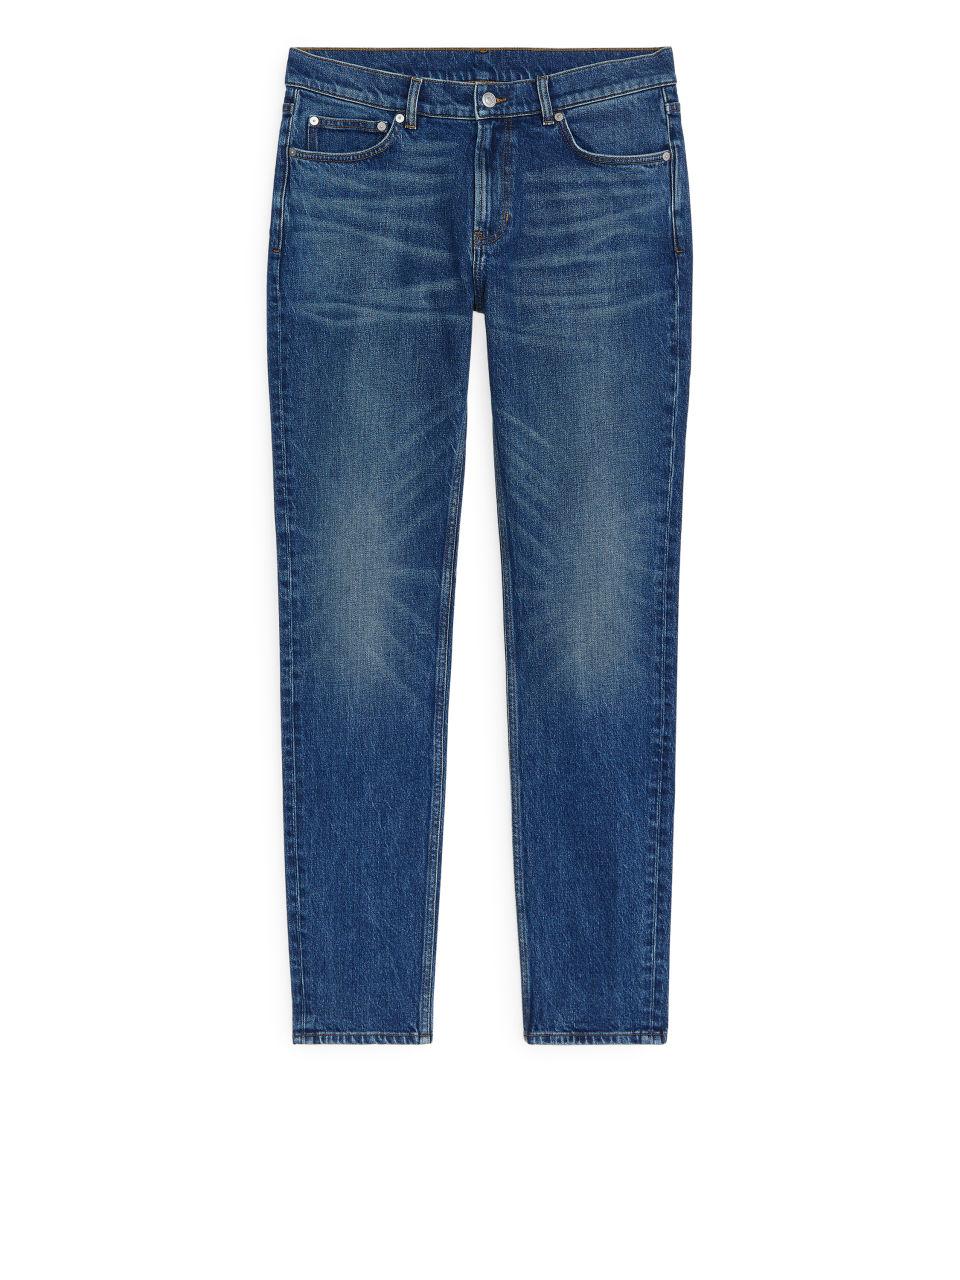 SLIM Stretch Jeans - Blue